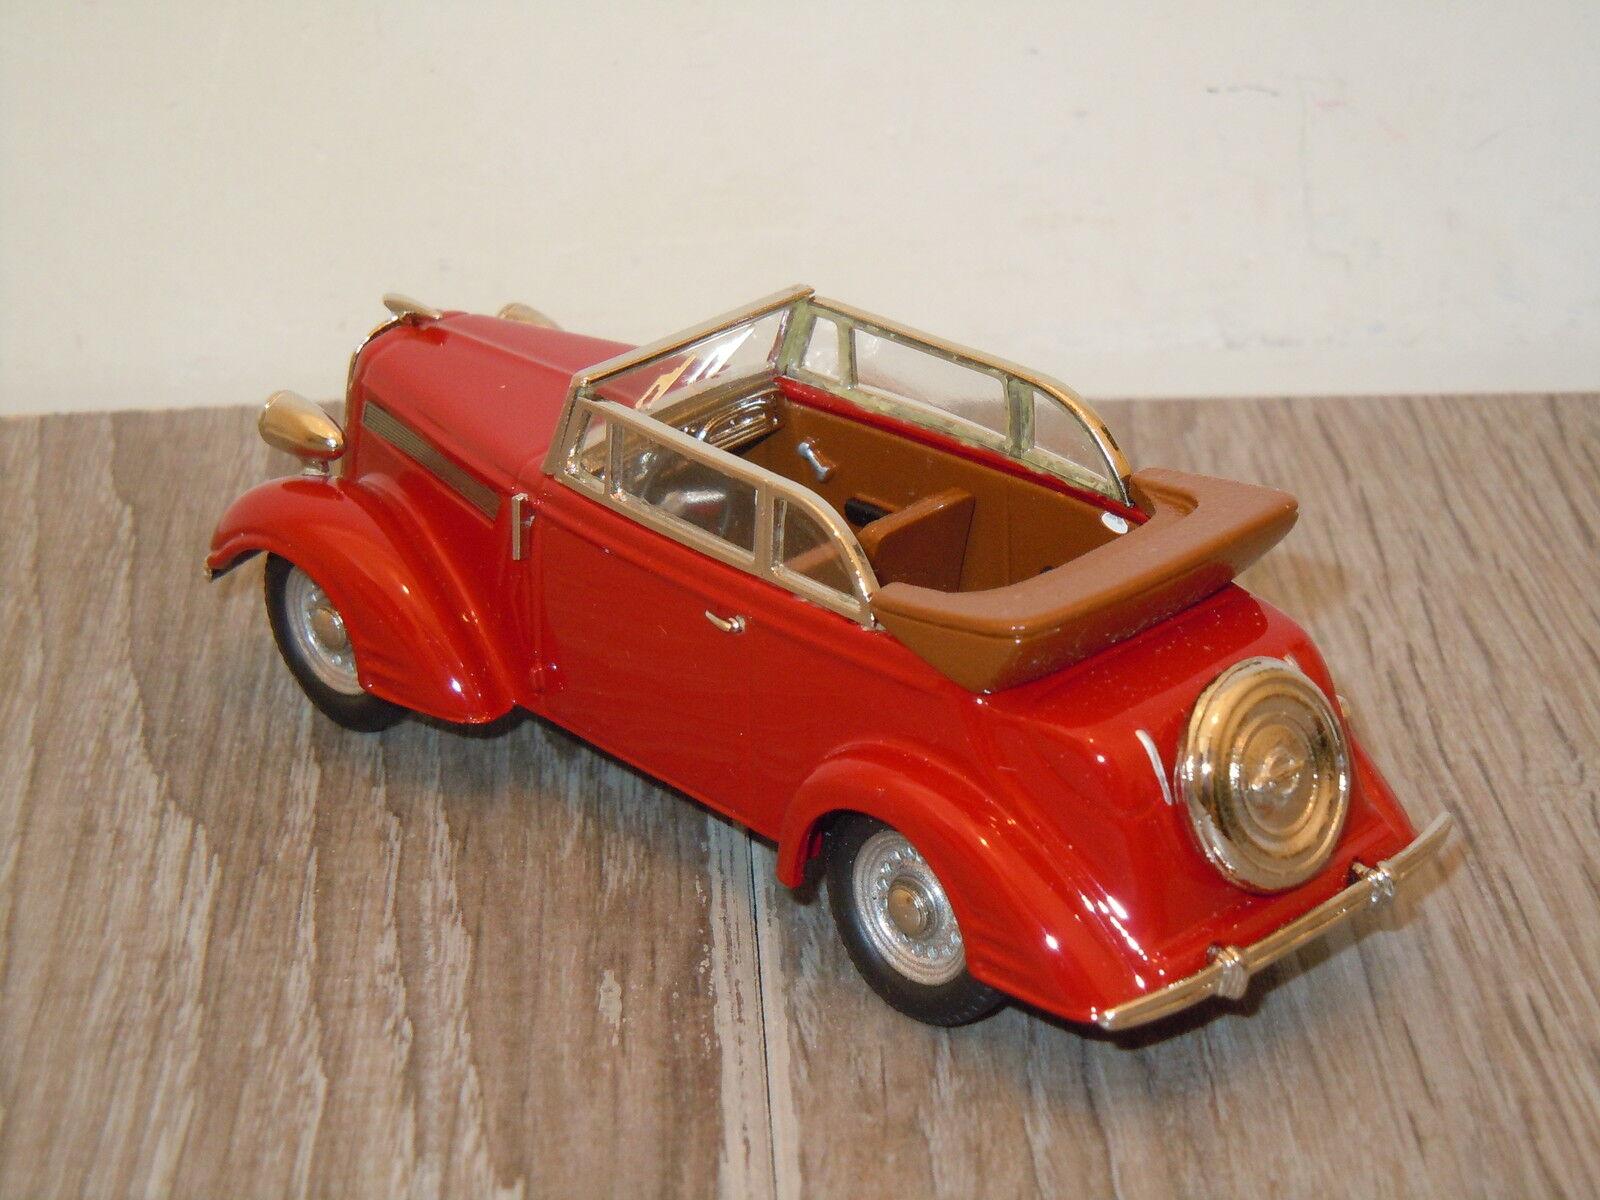 Opel Super 6 Cabriolet van Tin Wizard 3101 1 1 1 43 in Box 10701 410973